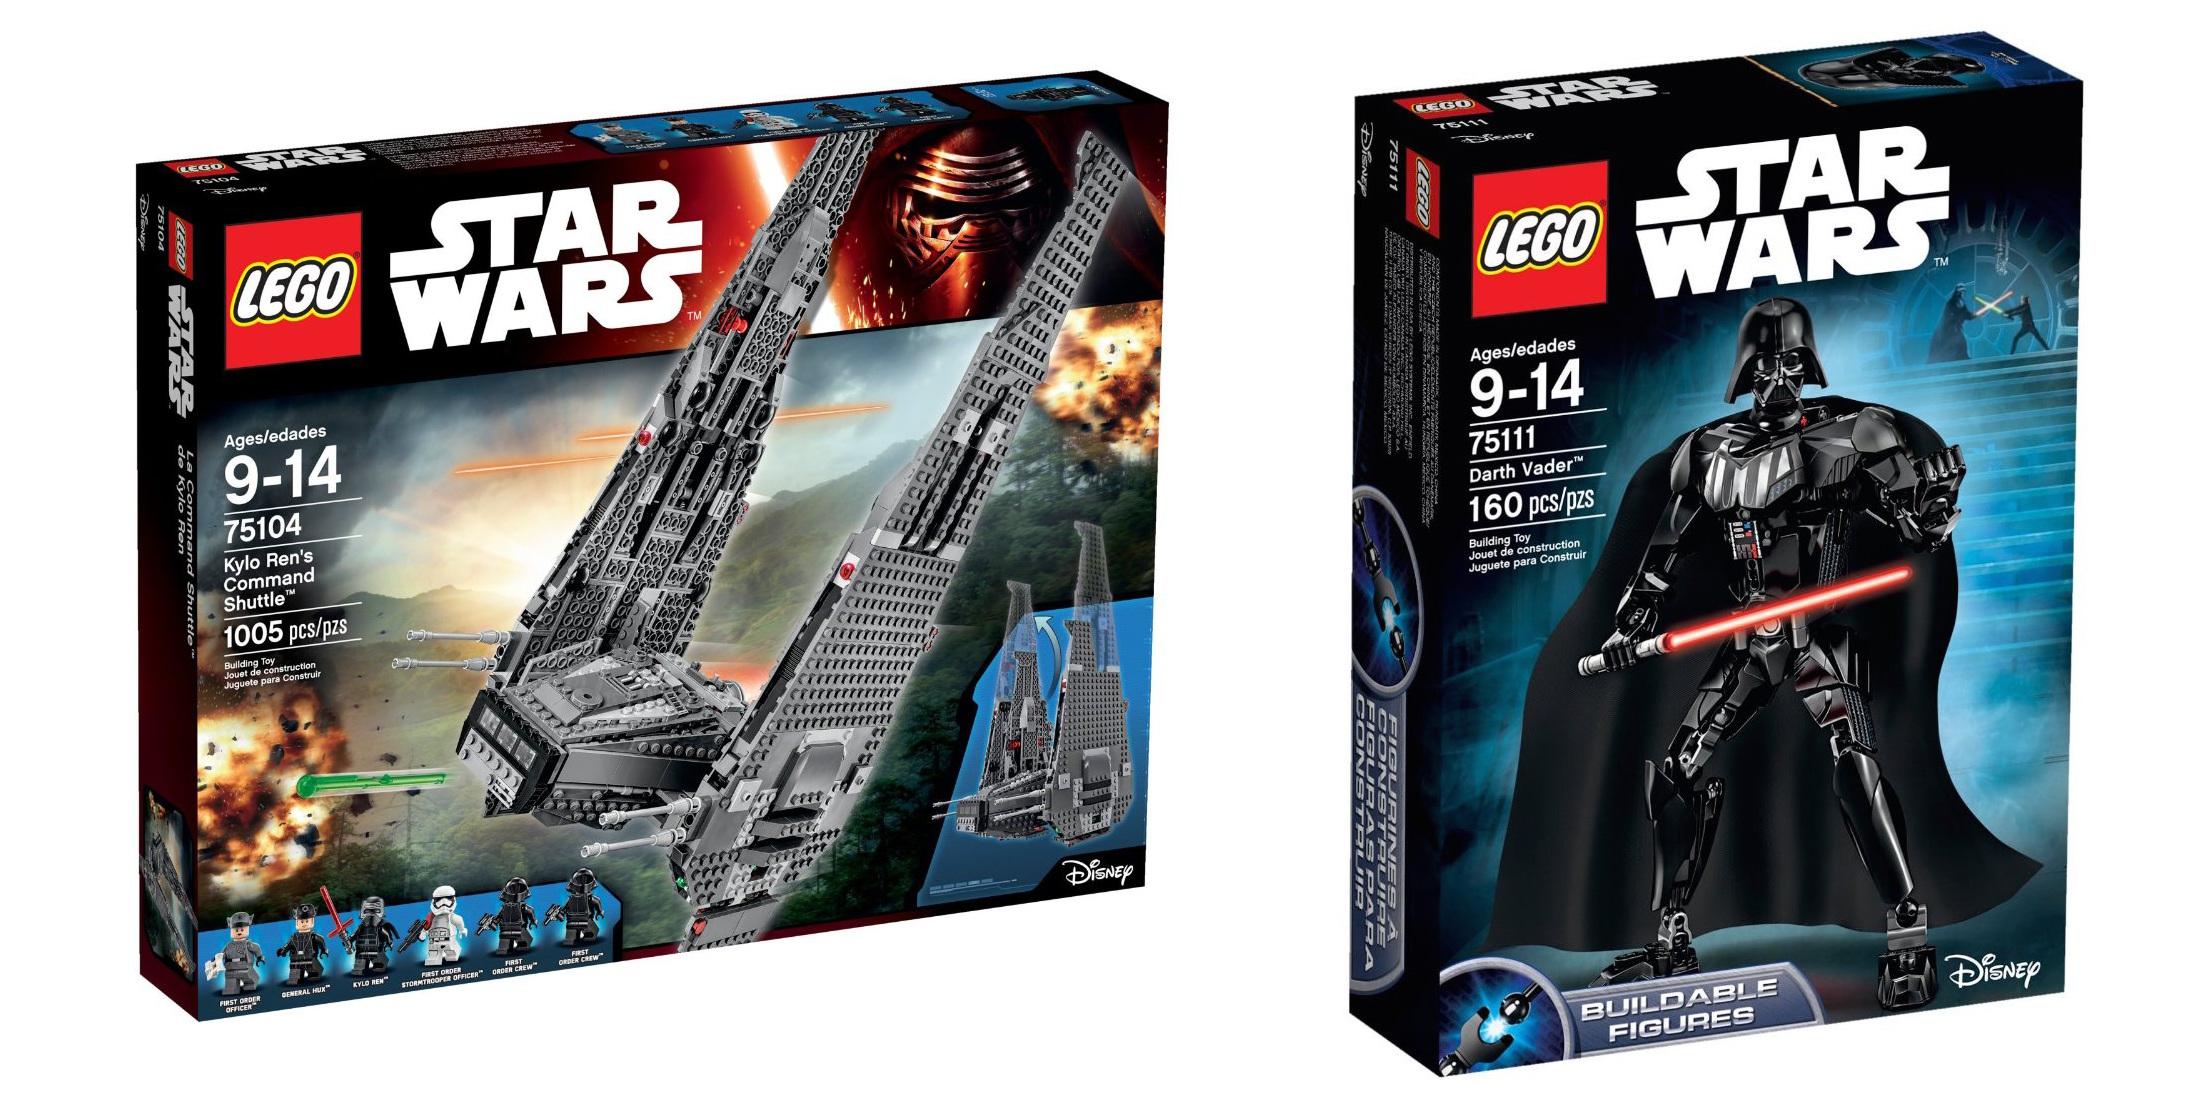 lego-star-wars-salekits-01